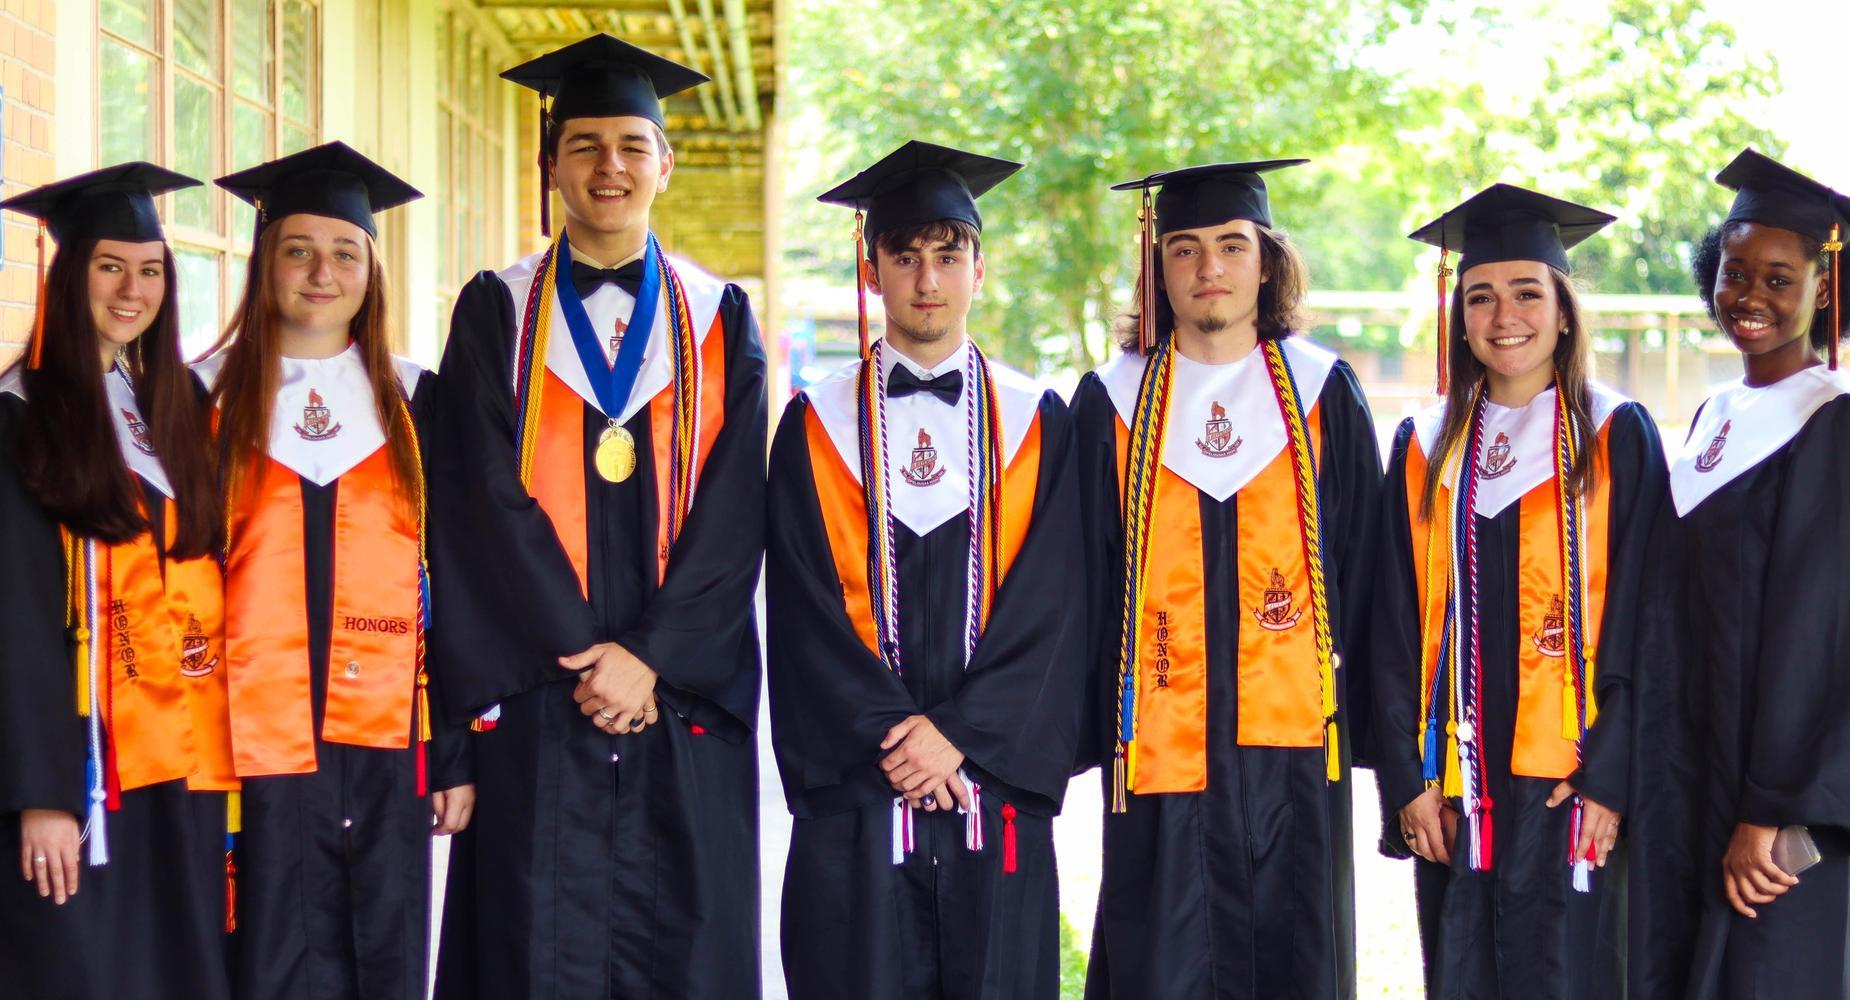 Opelousas High Graduates - PVE Walk of Fame